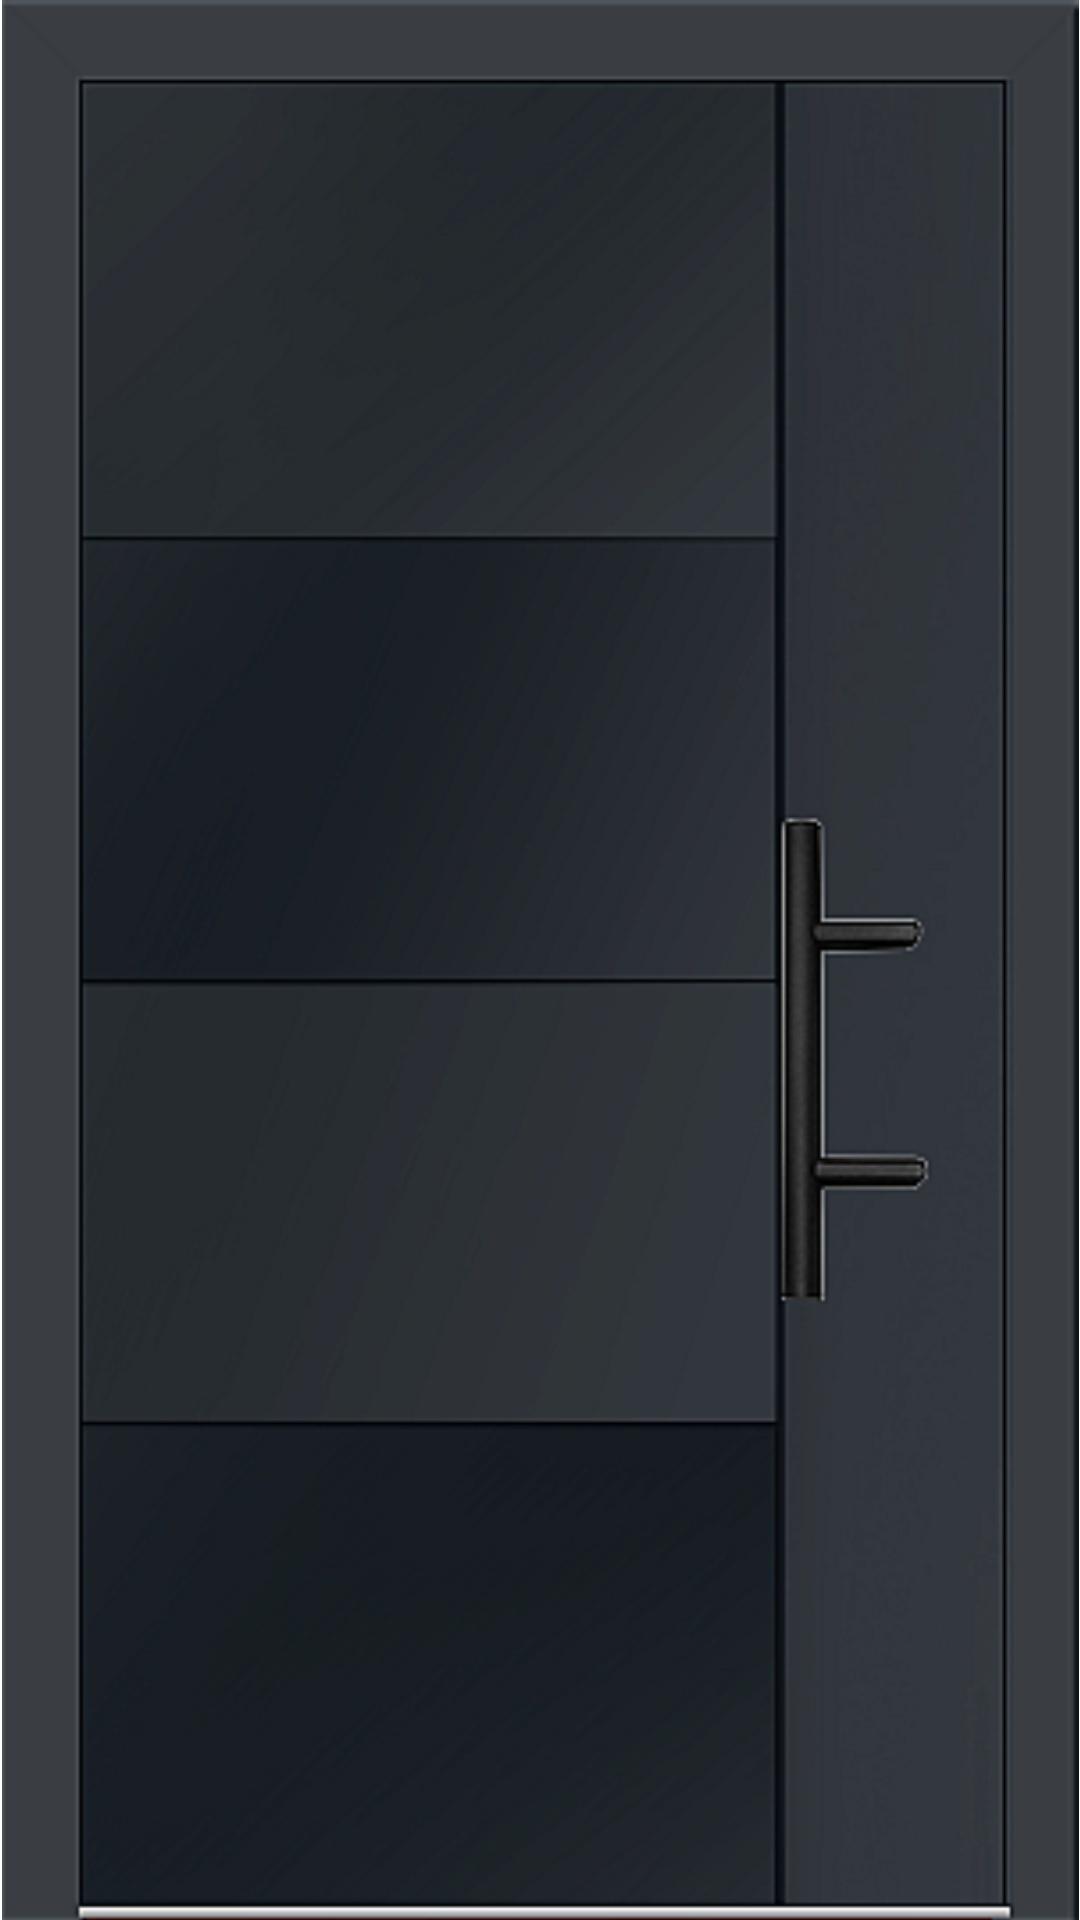 Holz-Alu Haustür Modell 66874 anthrazitgrau